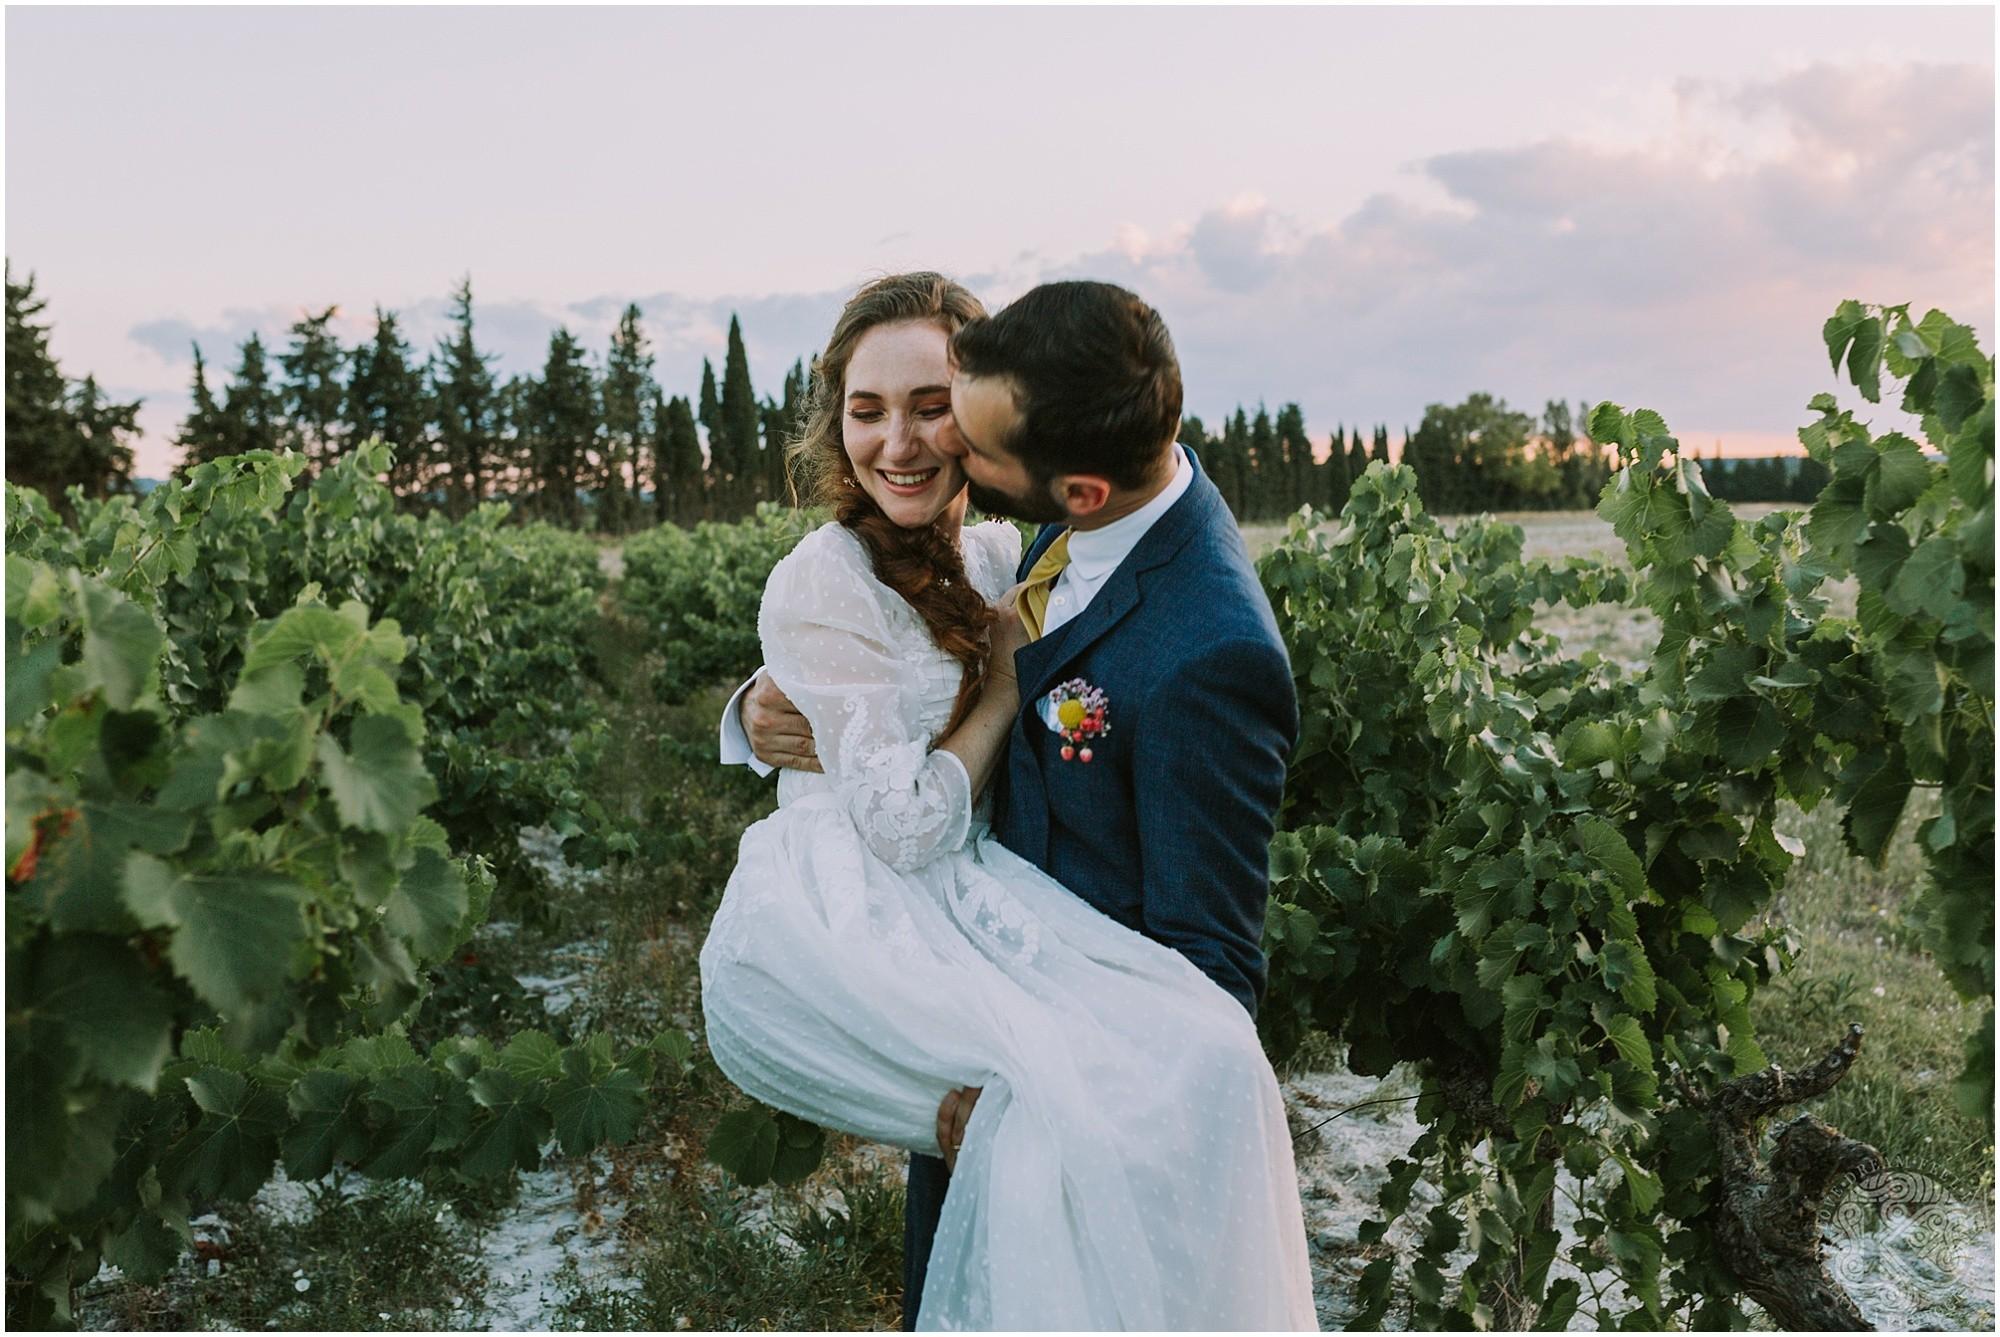 Kateryna-photos-photographe-mariage-vaucluse-provence-avignon-ferme-st-hugues_0082.jpg